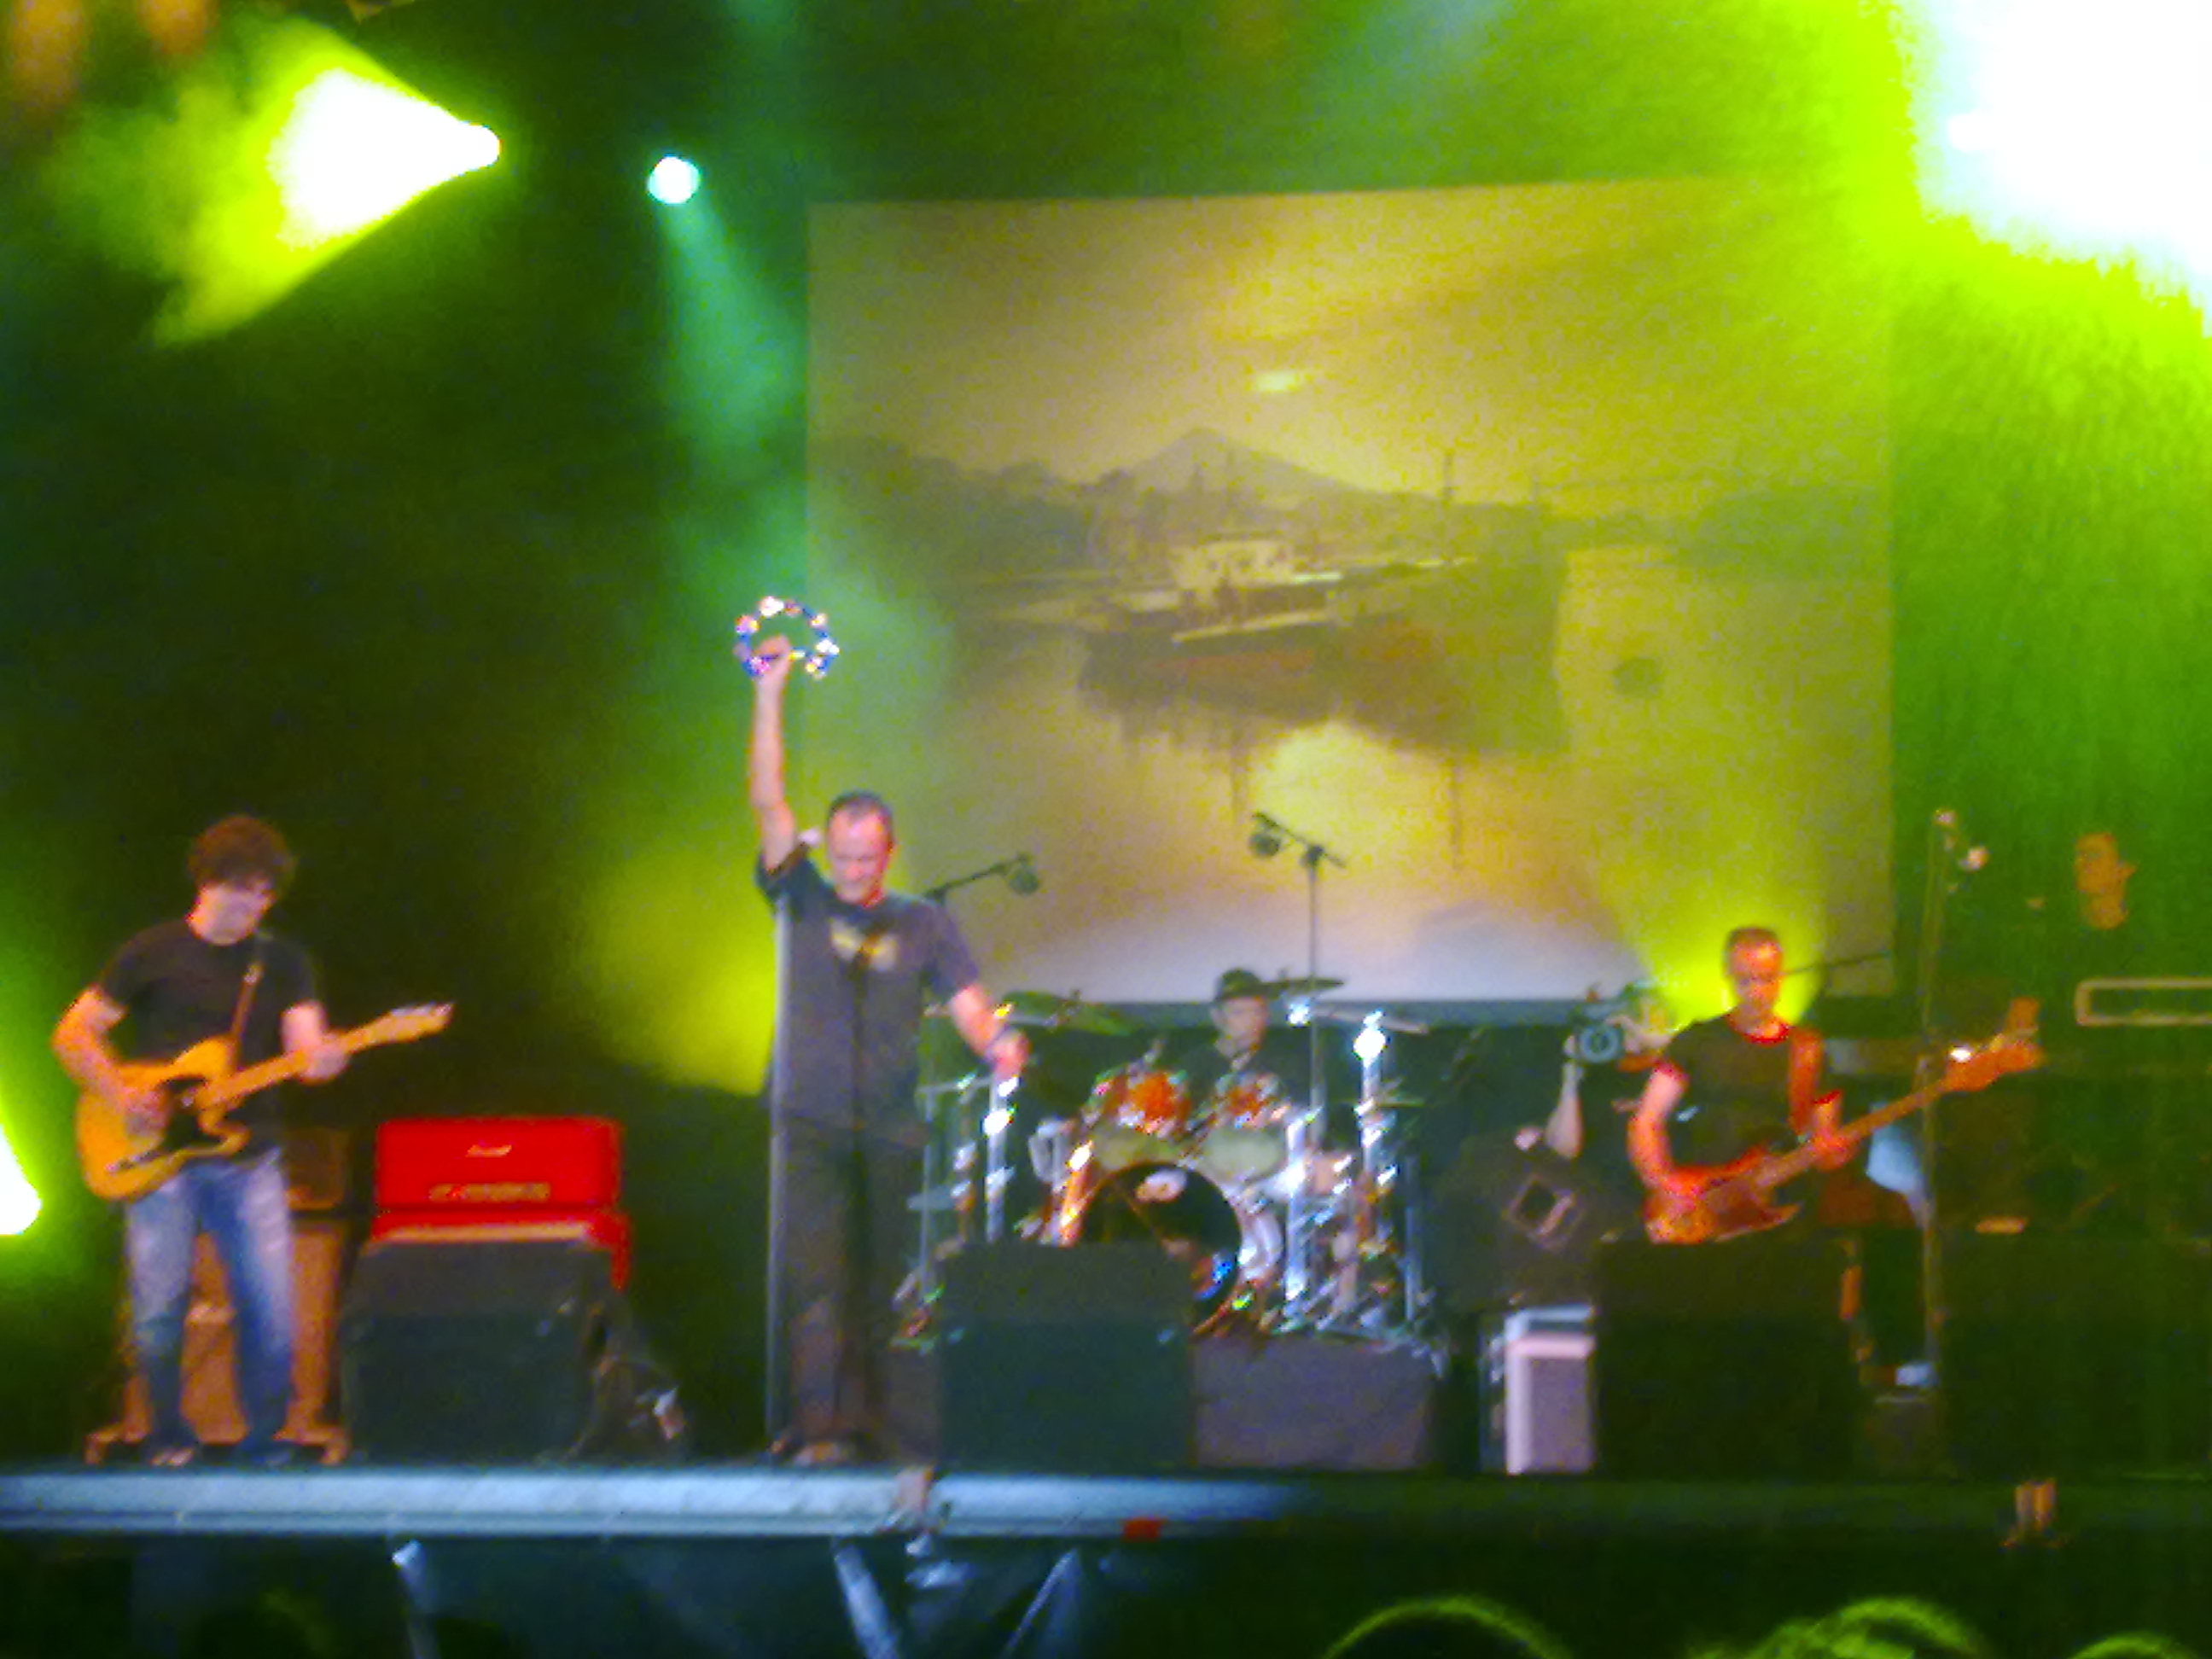 Zarama en directo ayer en Bilbao